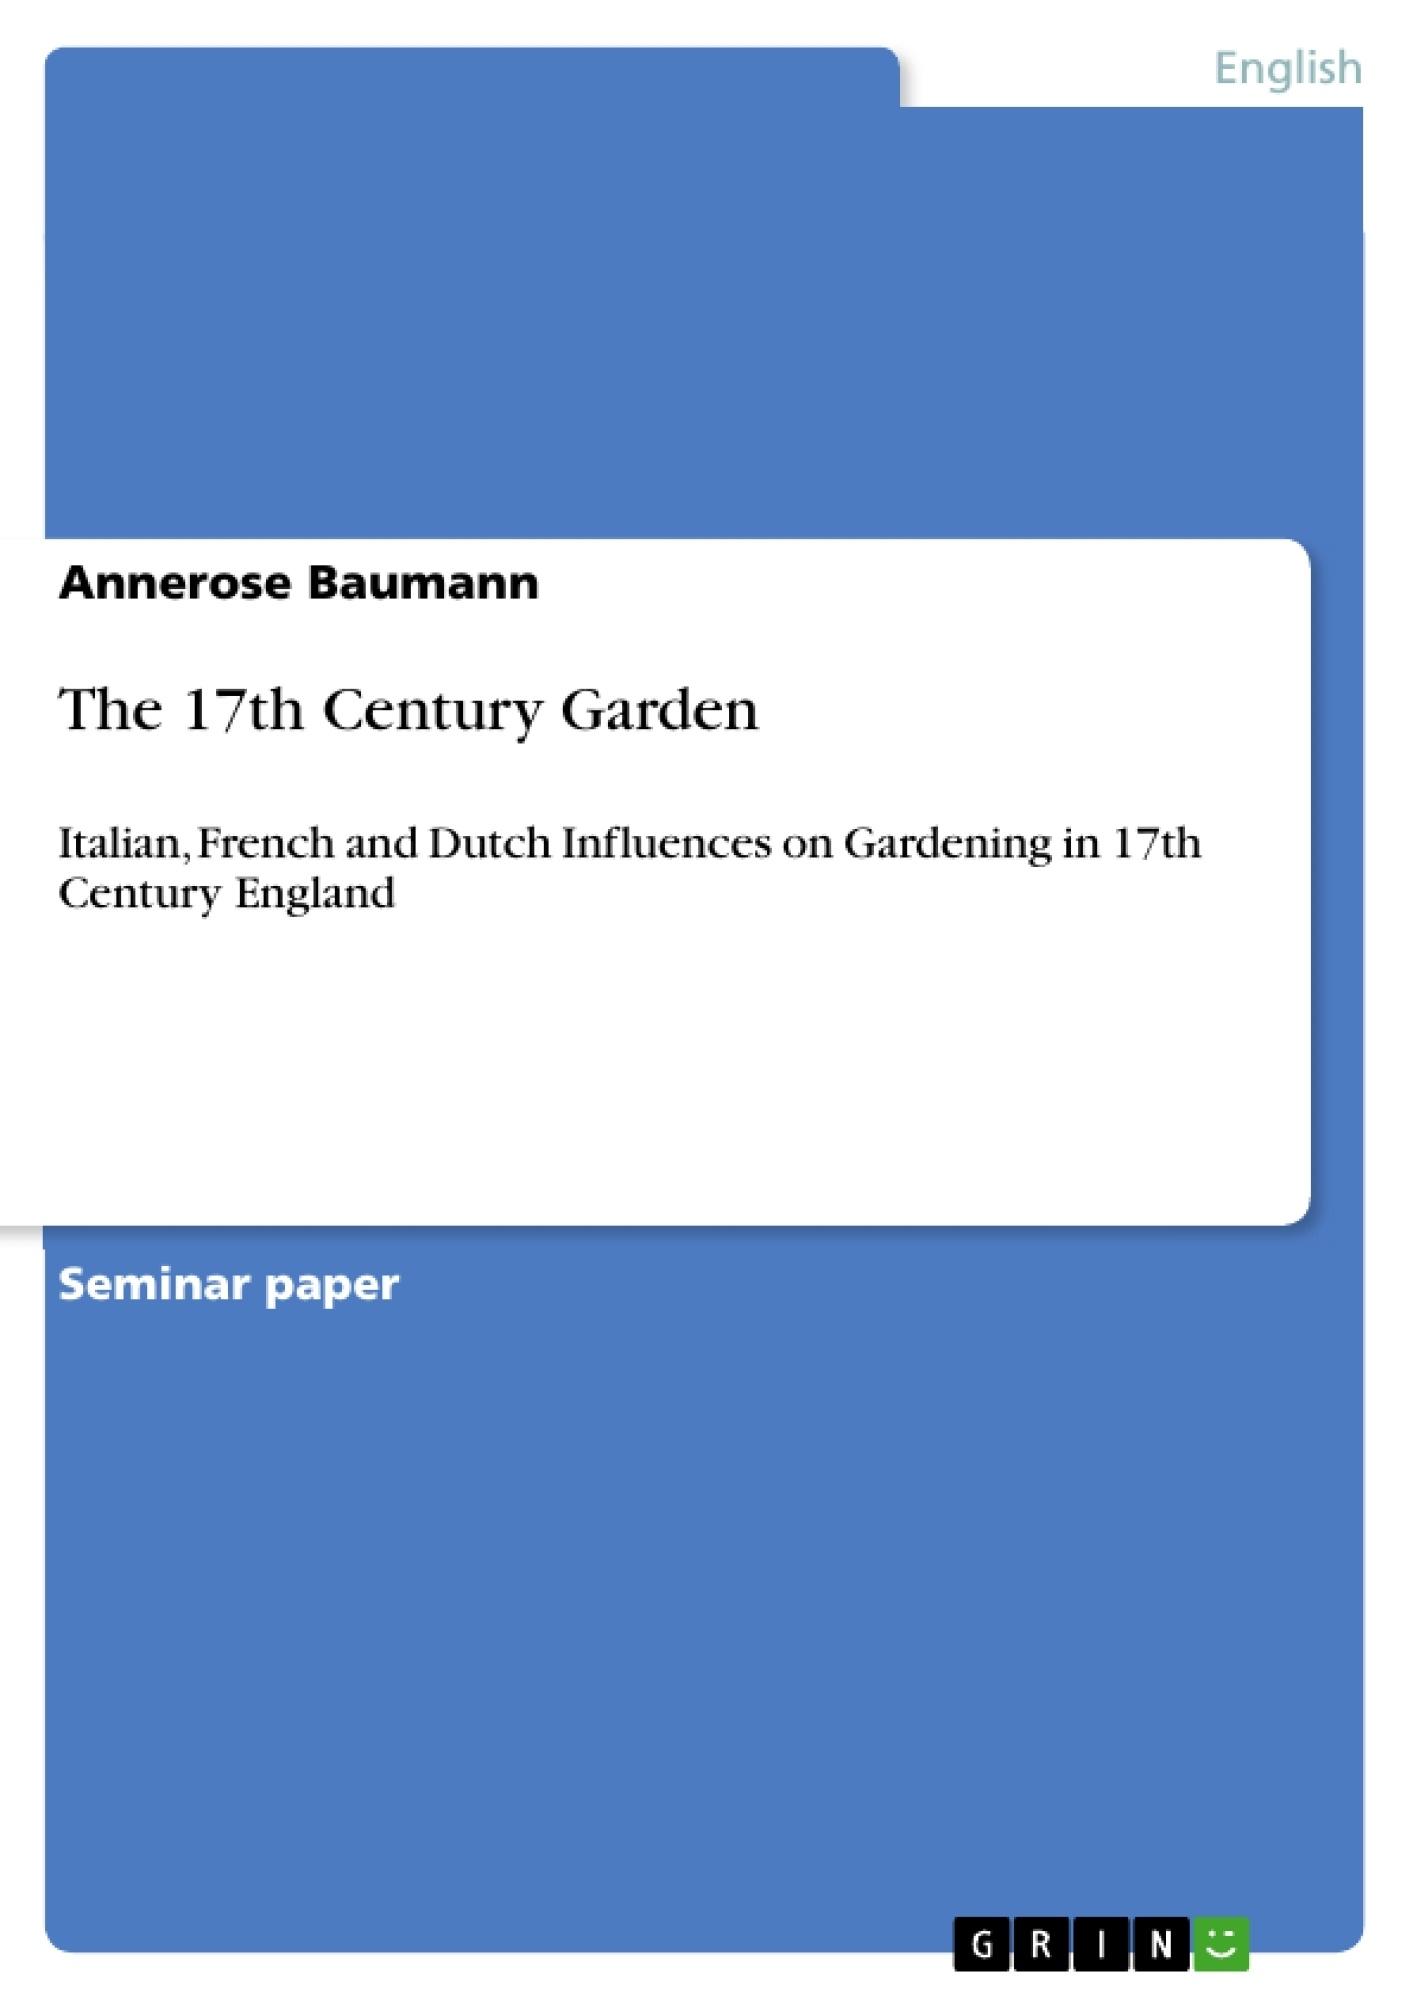 Title: The 17th Century Garden